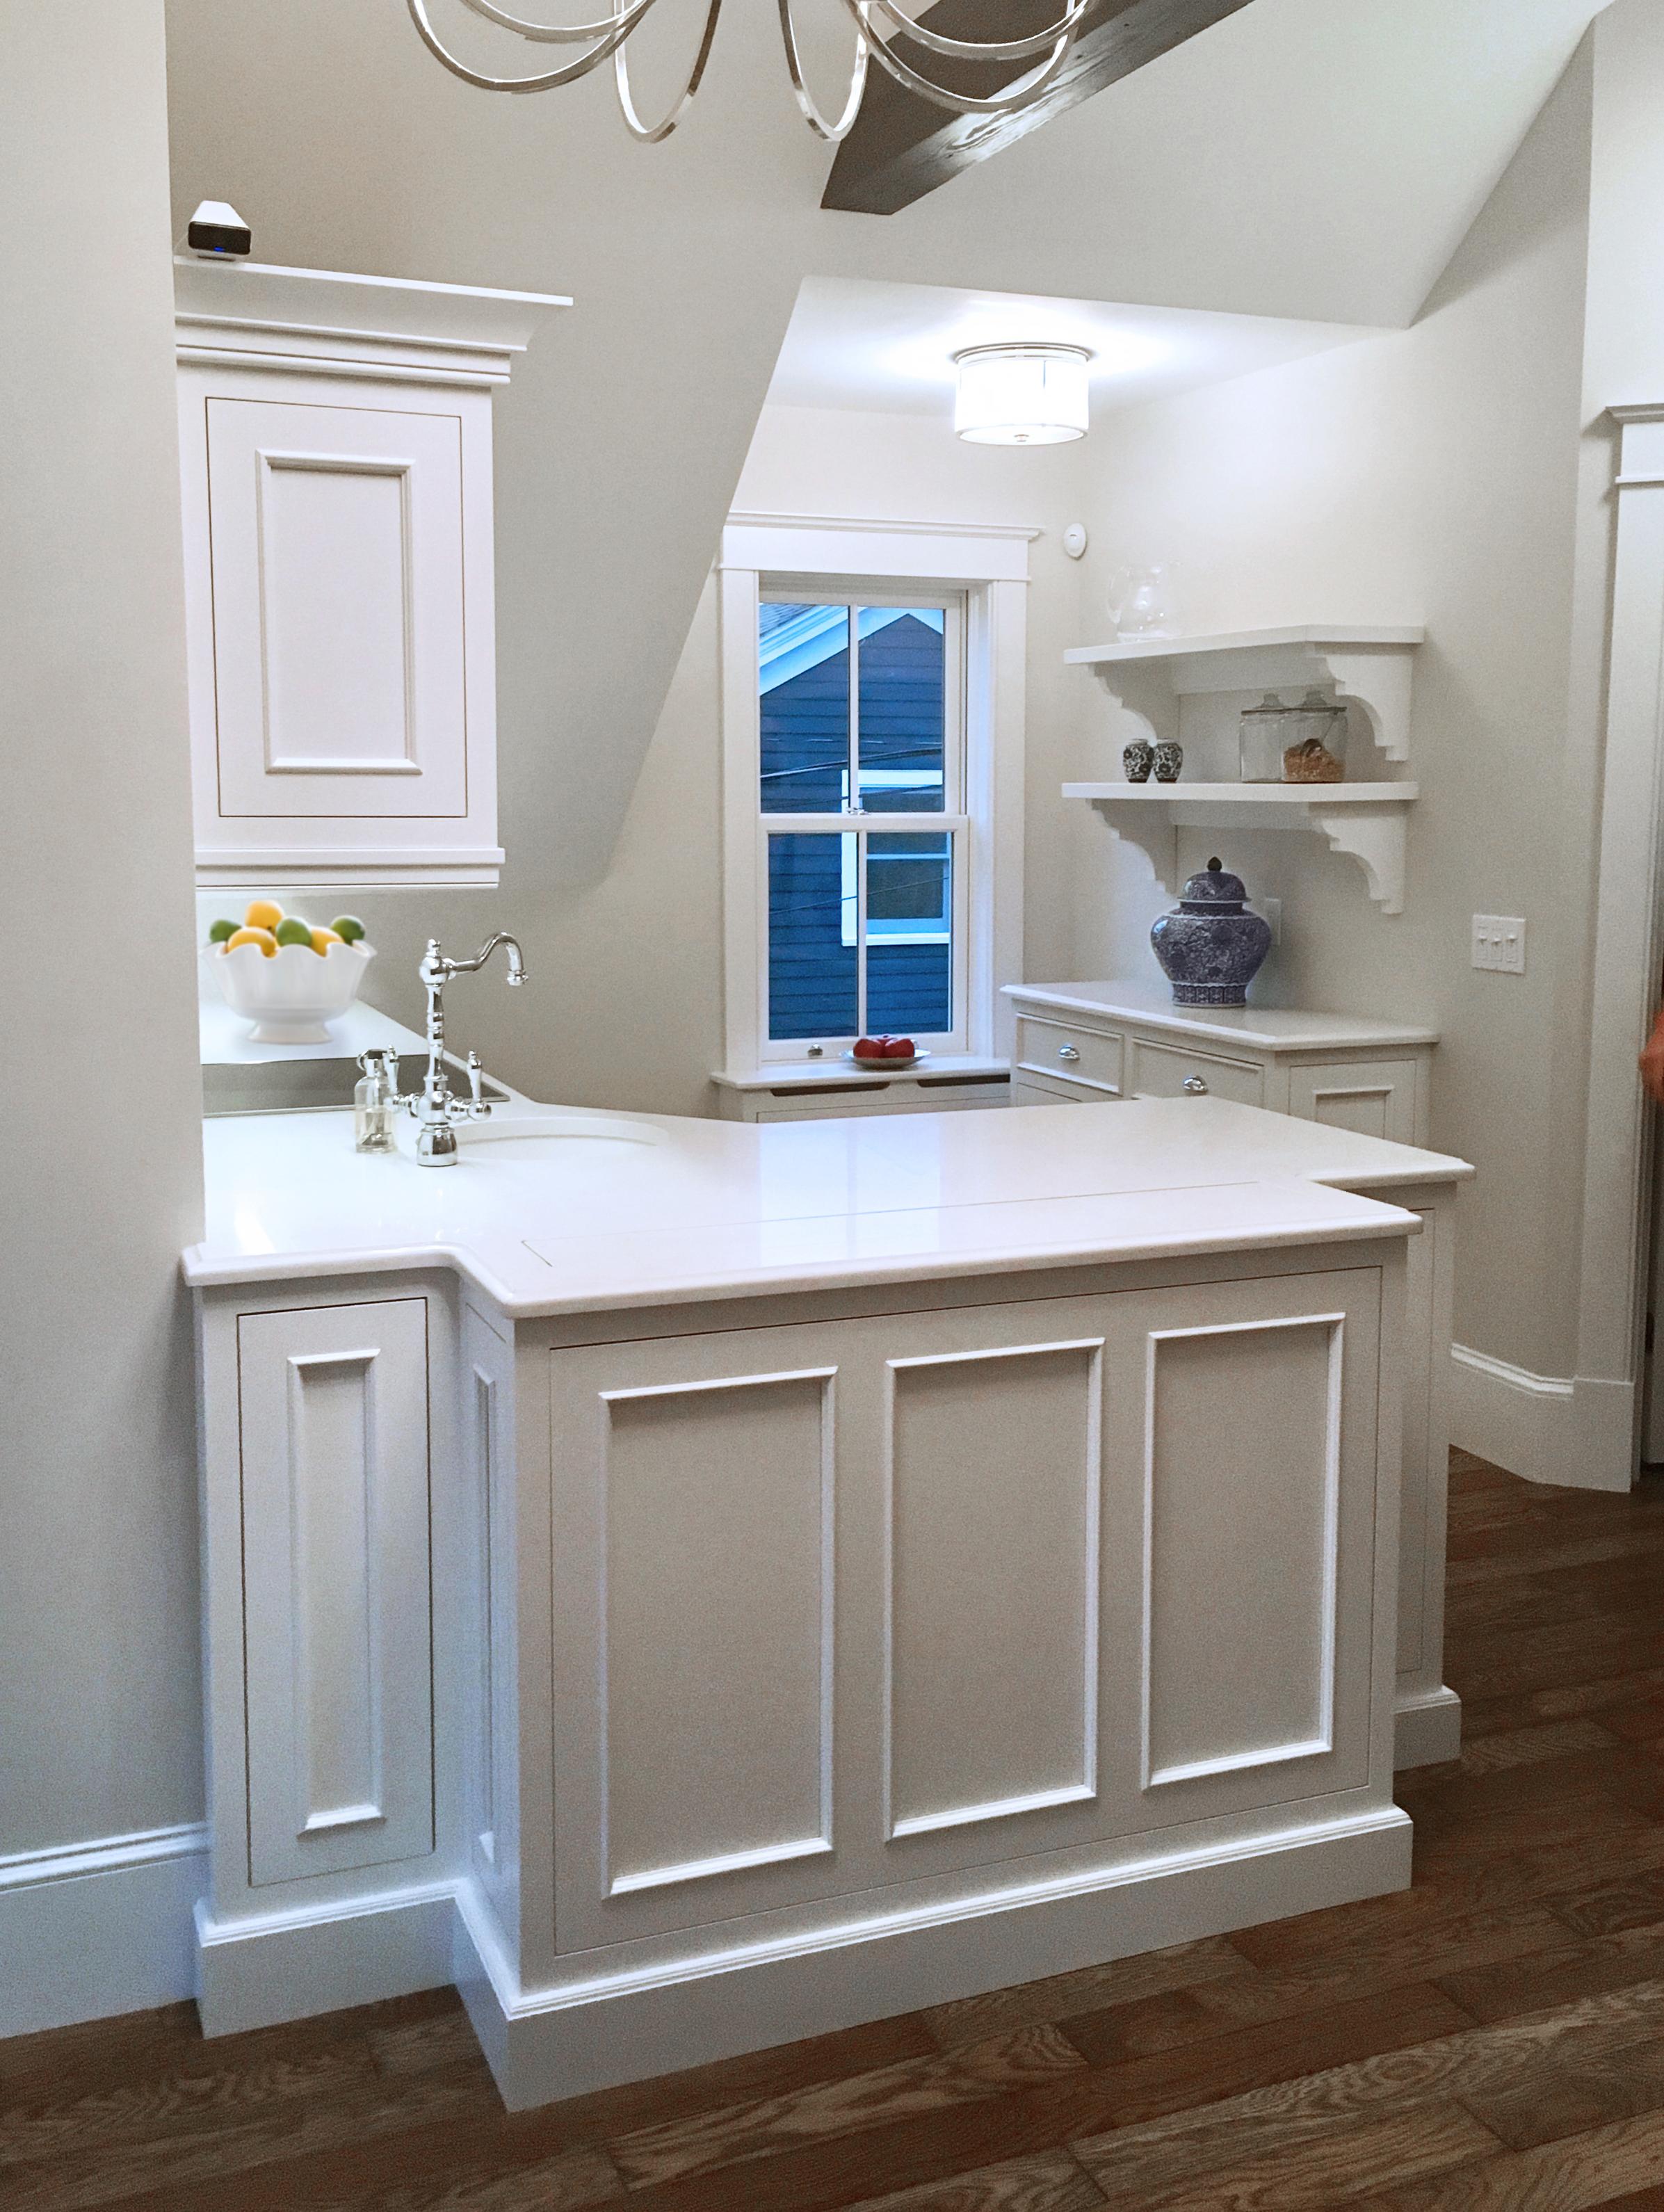 Small Space Kitchen - Lewis & Weldon Custom Kitchens